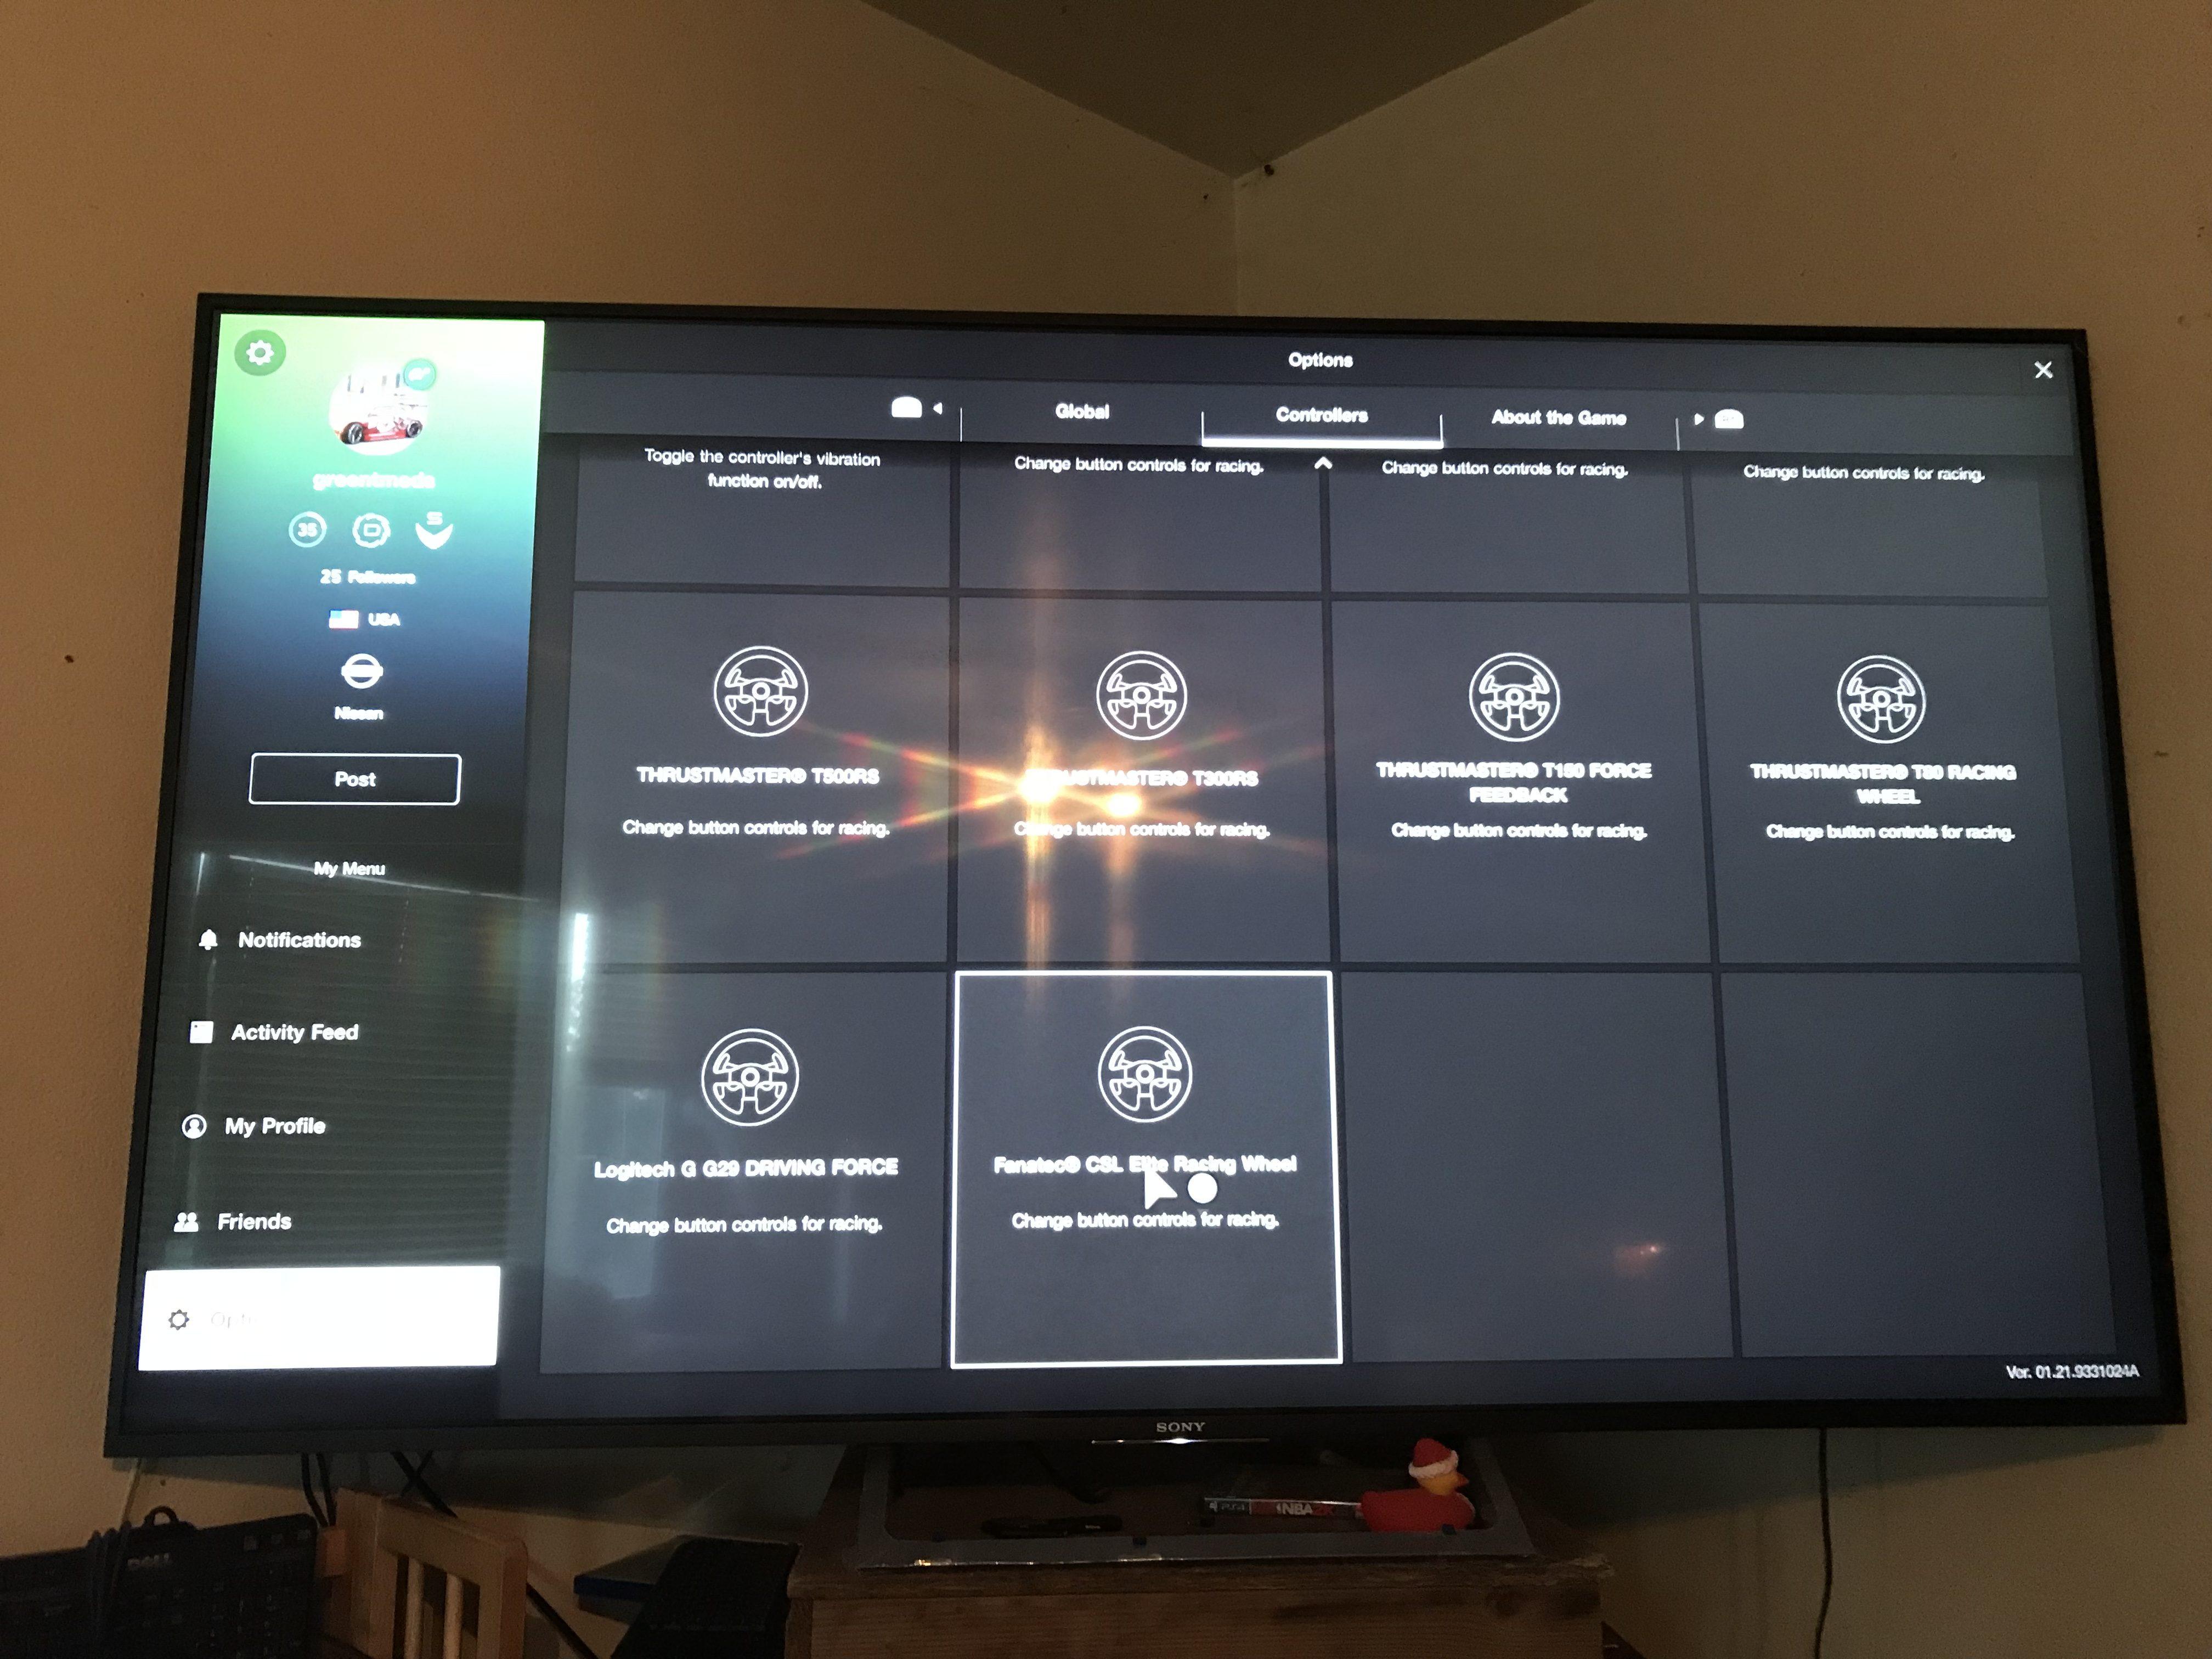 Force feedback and wheel settings